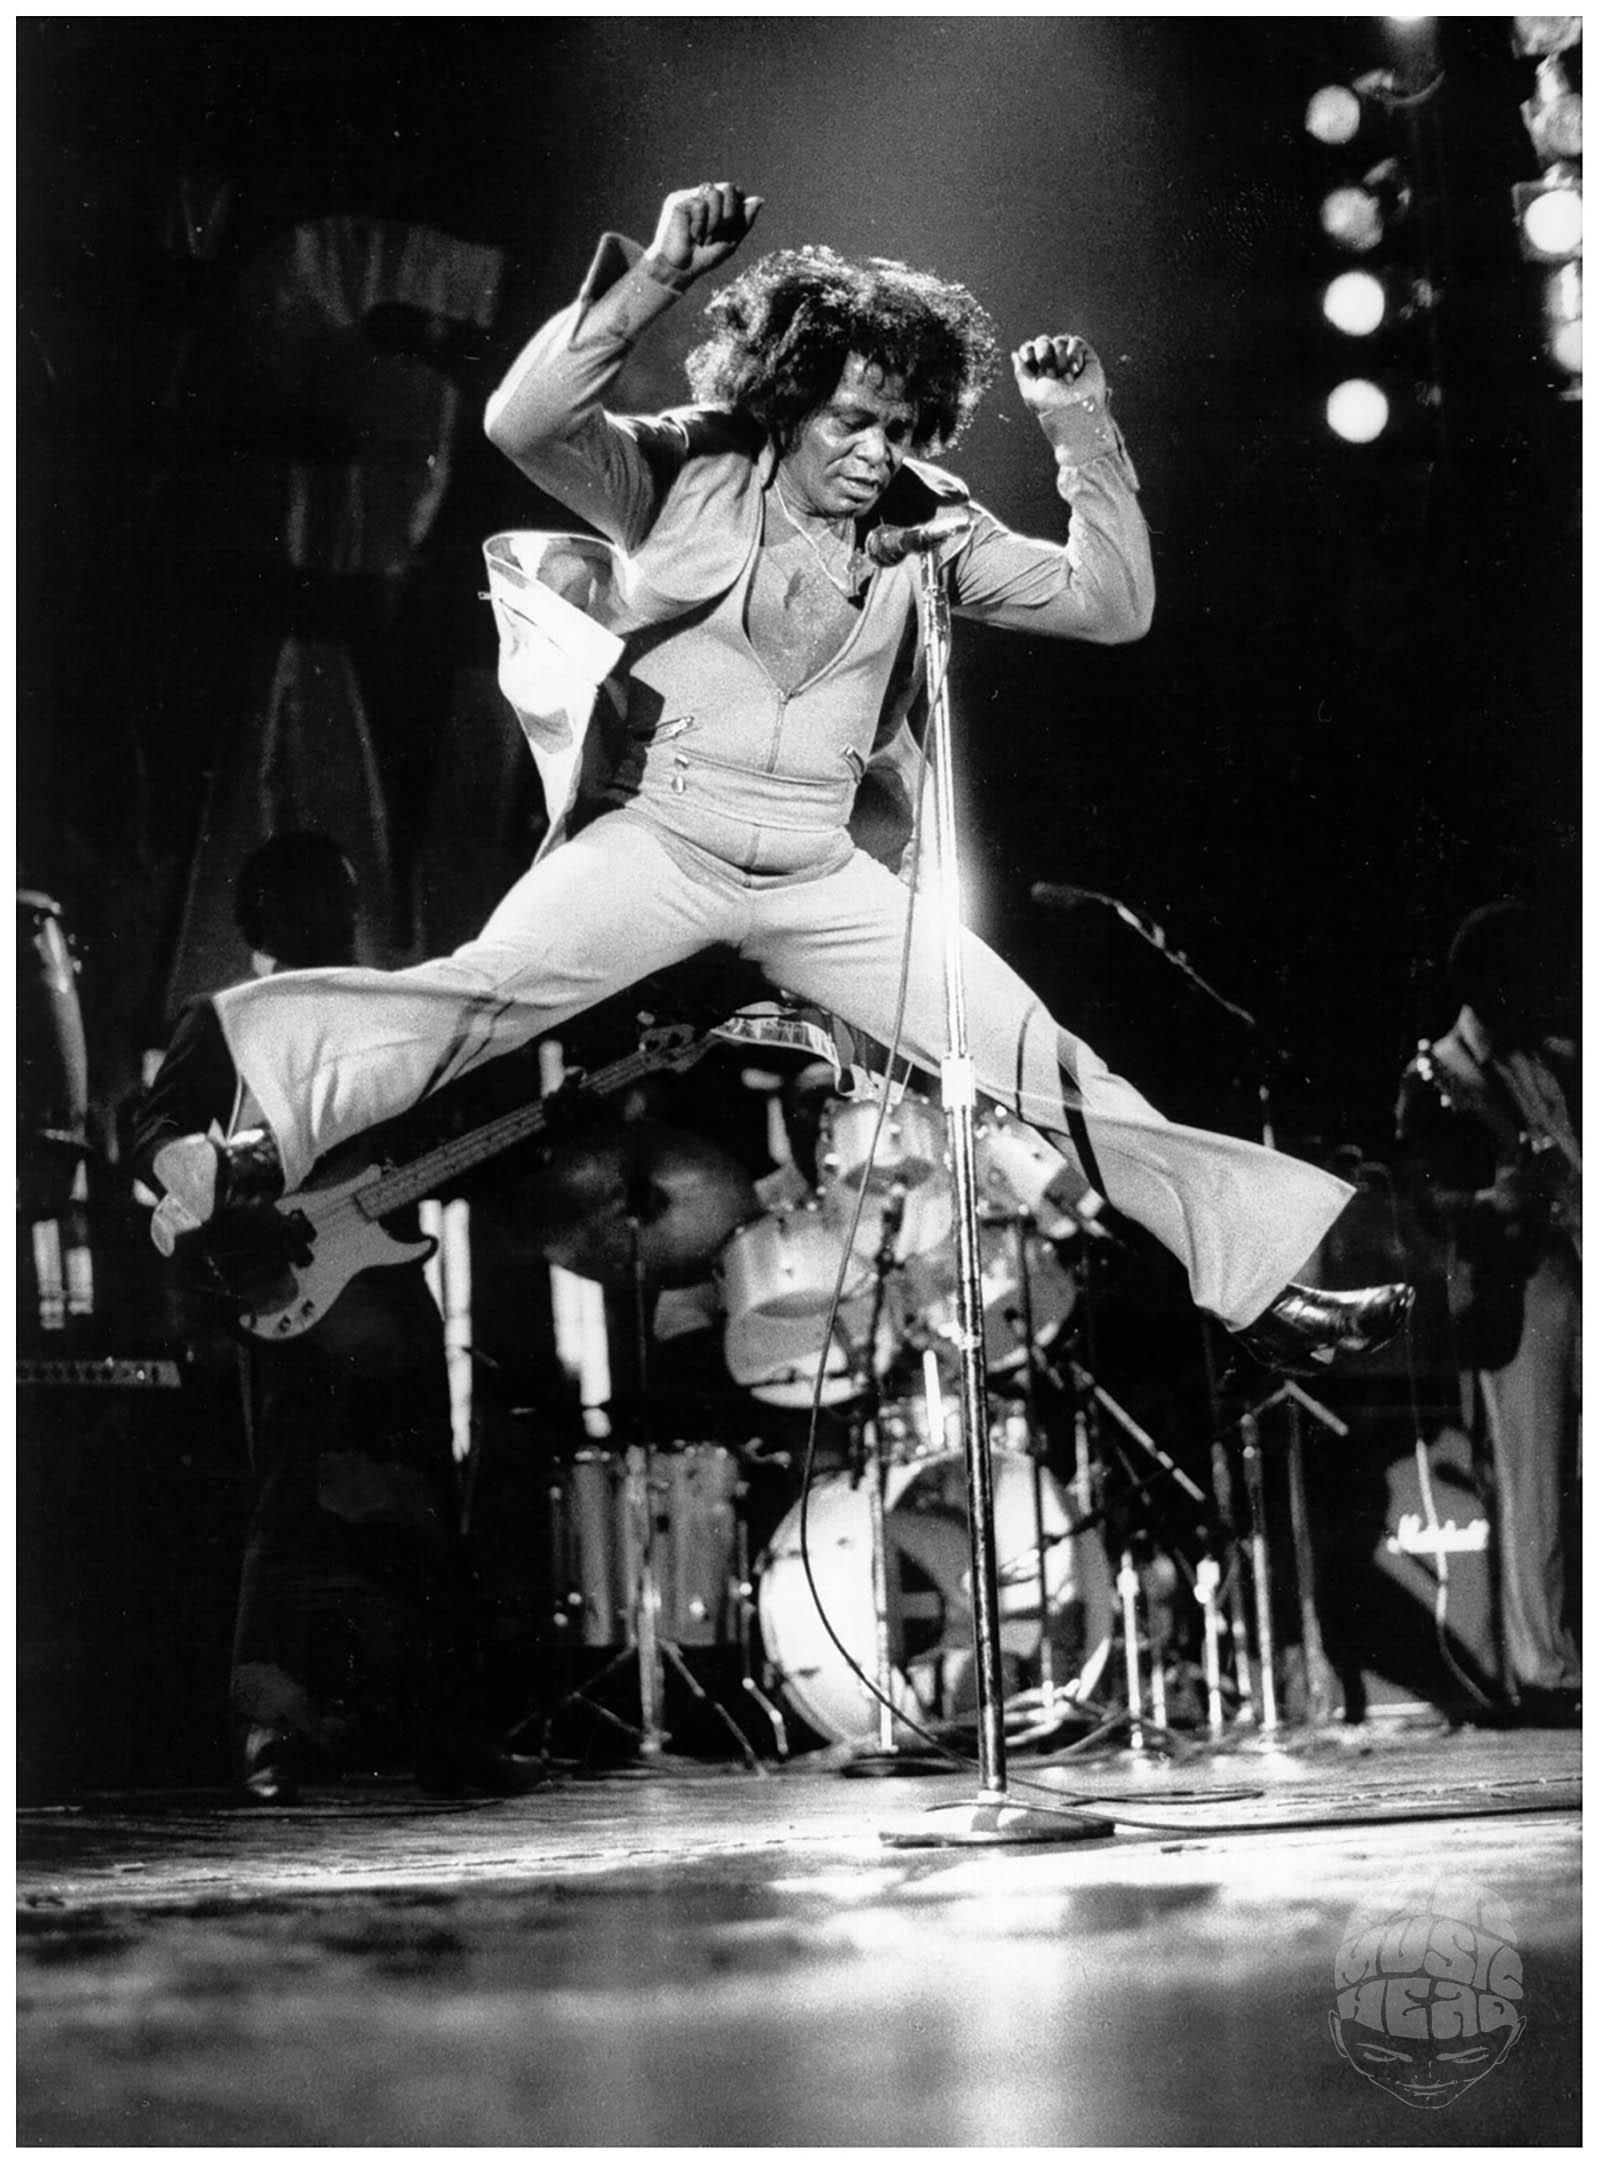 david corio_james brown_live jump.jpg